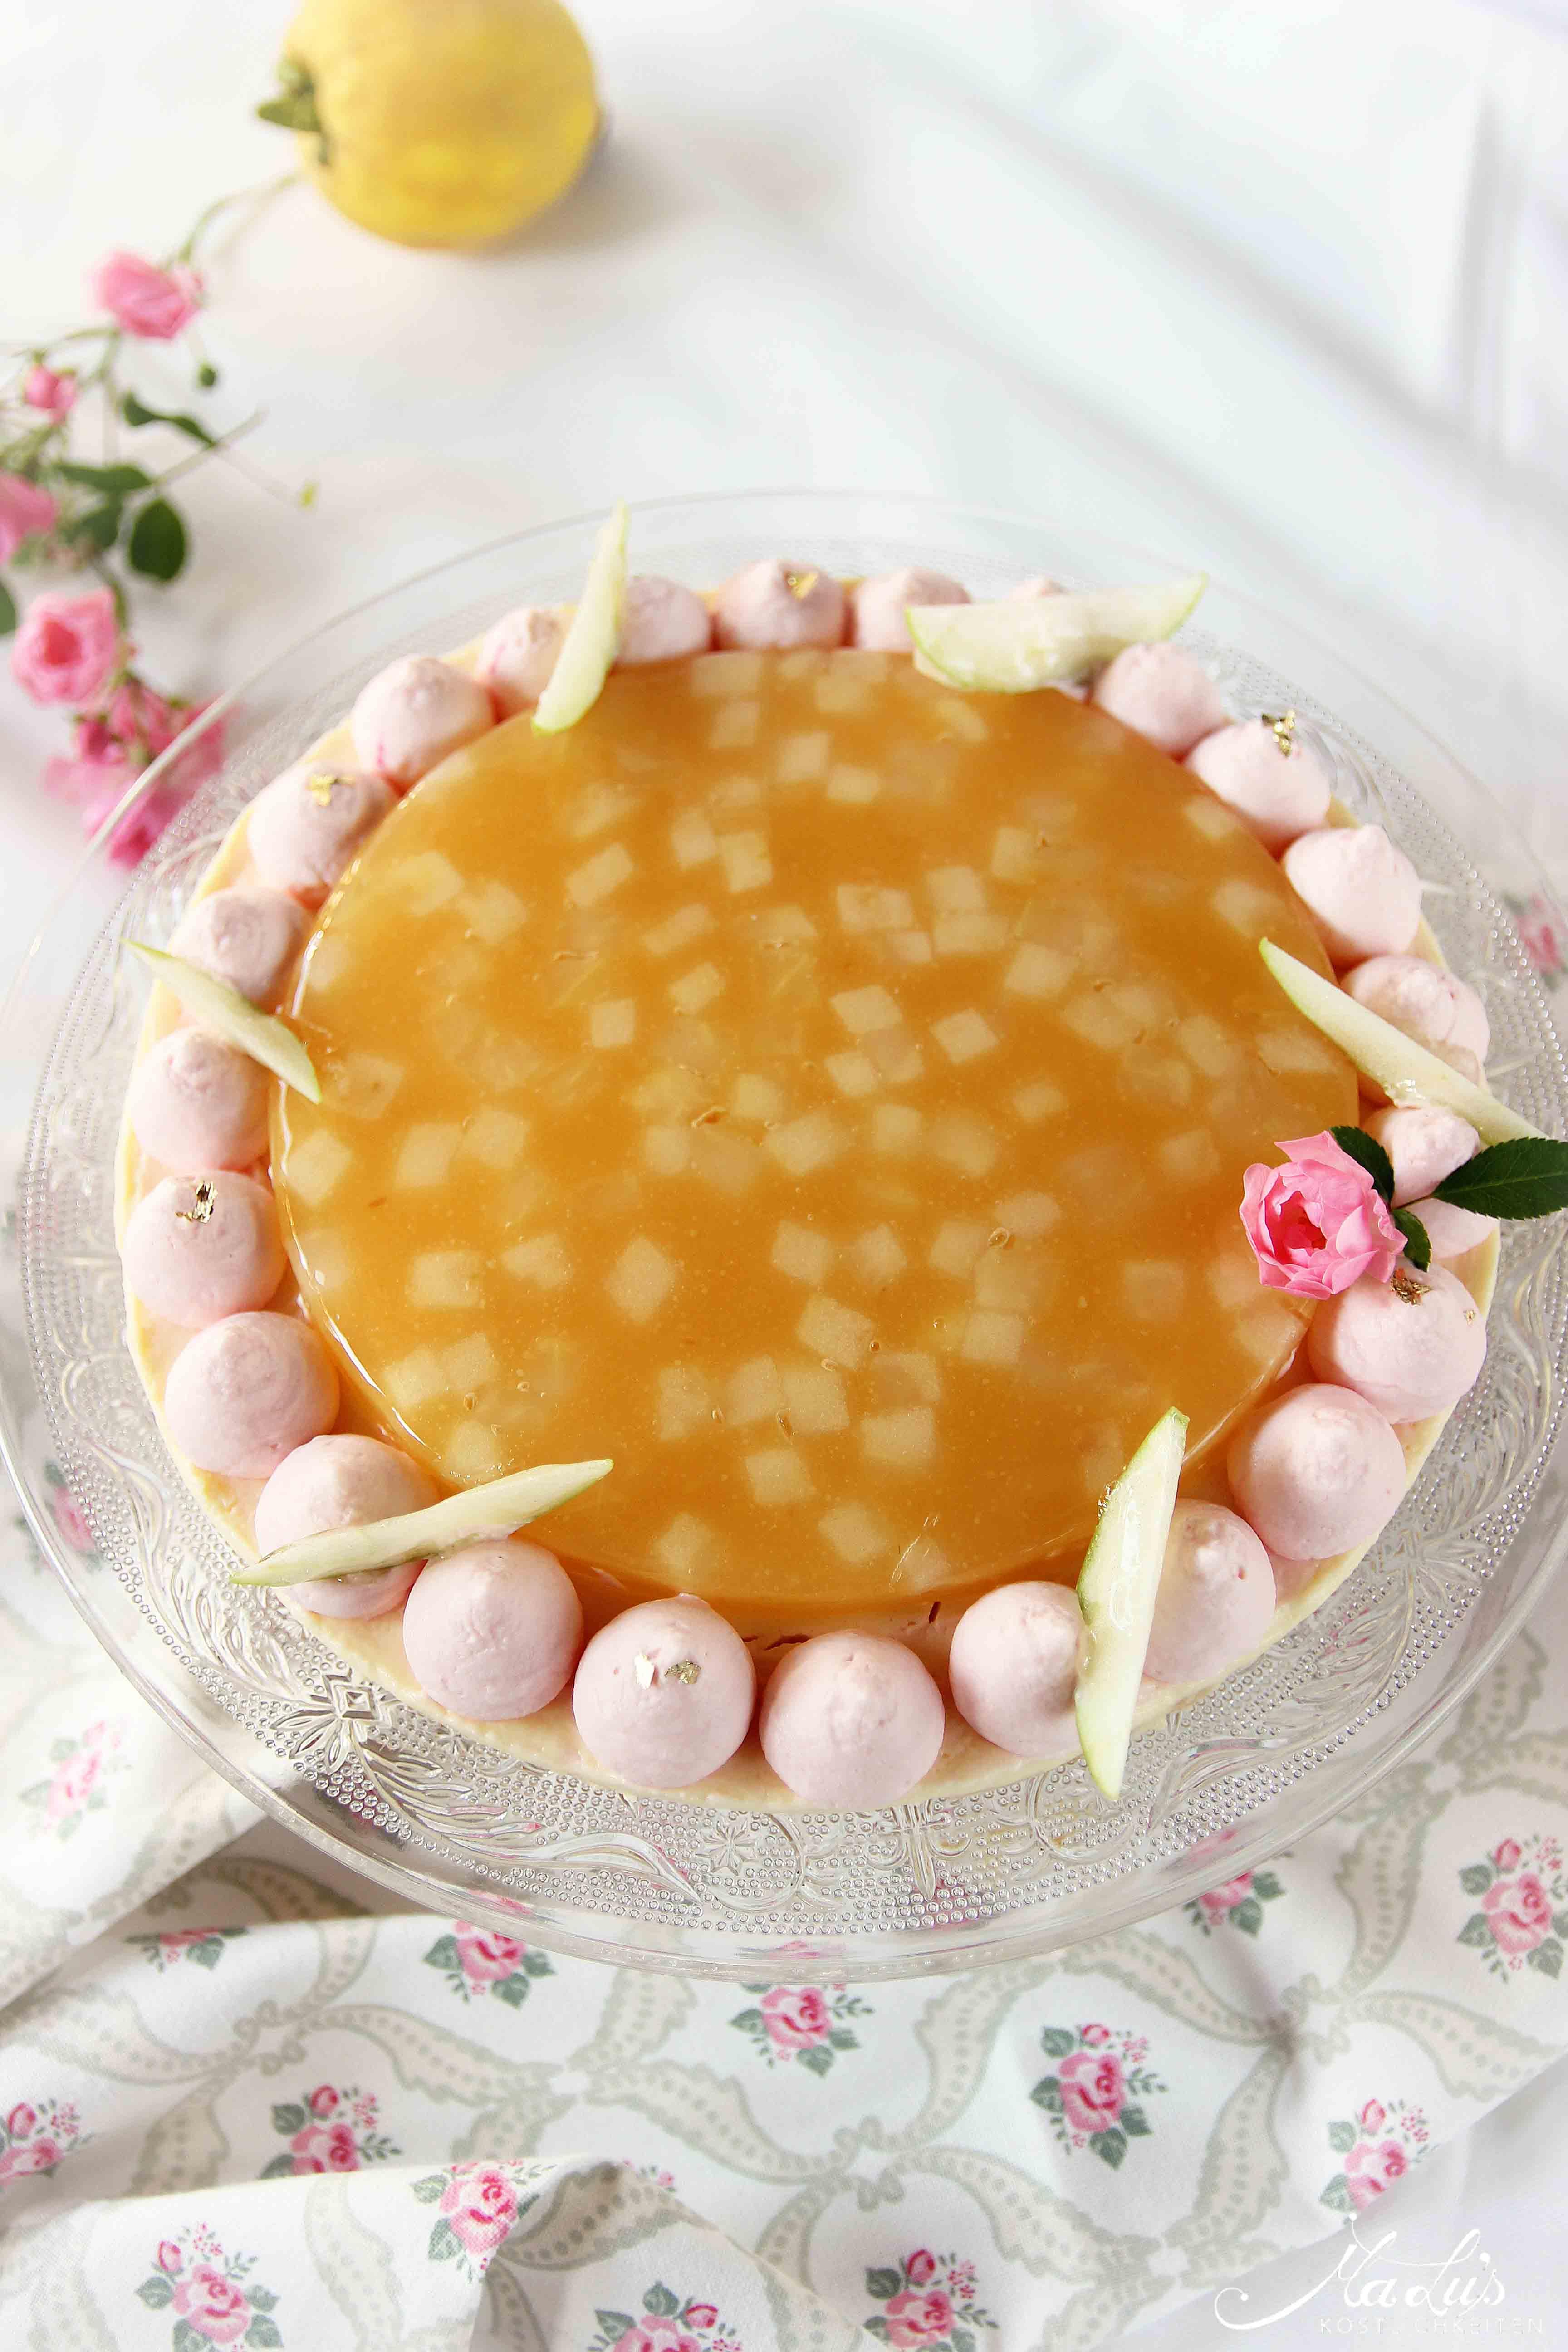 Fantastik Cheesecake Apfel-Quitte